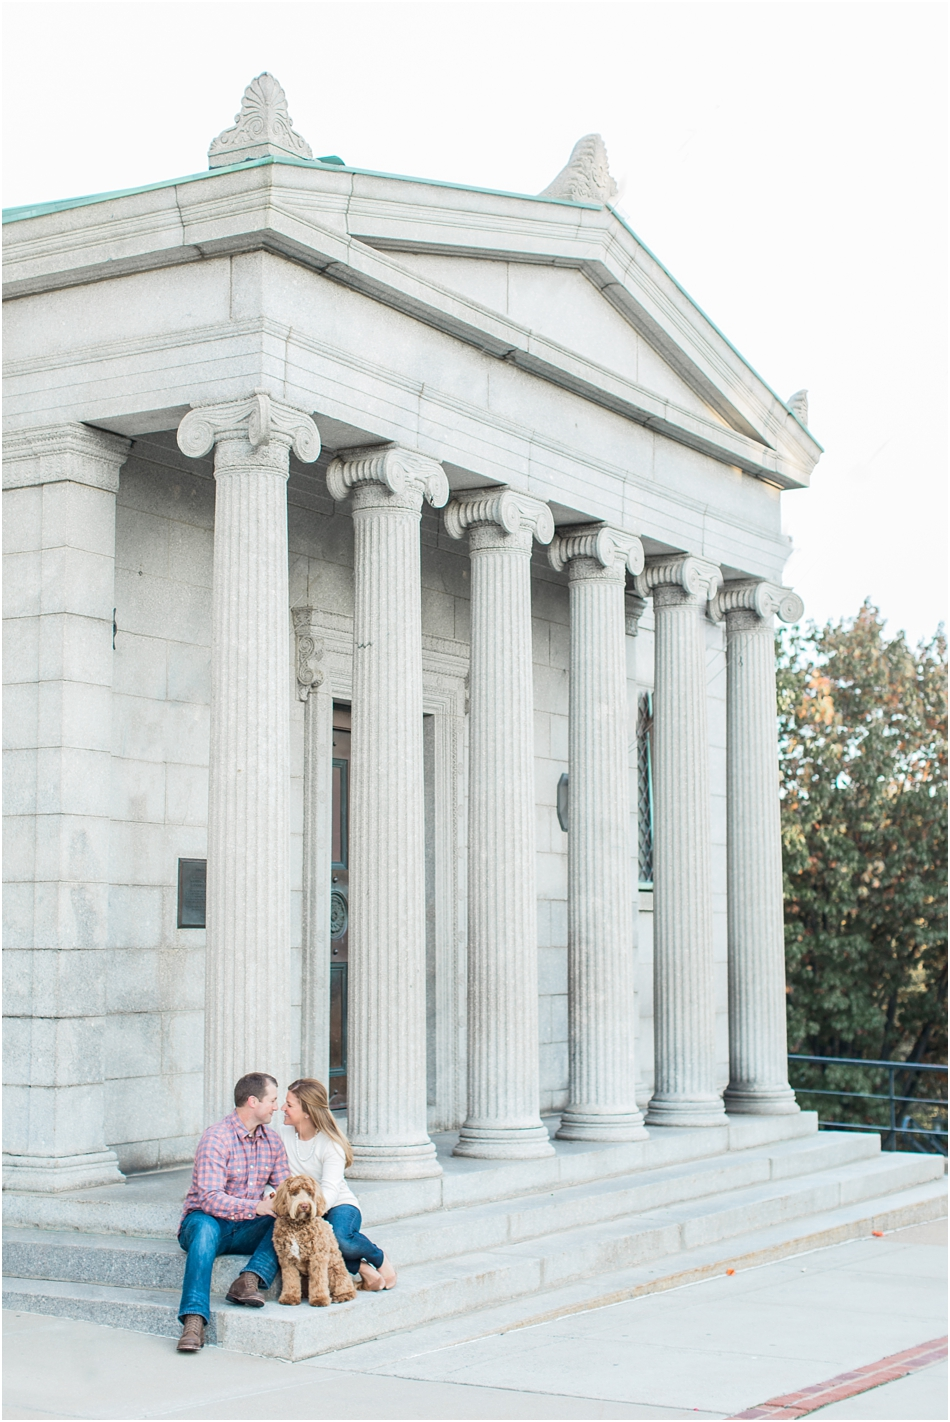 charlestown_engagement_kyndra_matt_goldendoodle_cape_cod_boston_new_england_wedding_photographer_Meredith_Jane_Photography_photo_0153.jpg